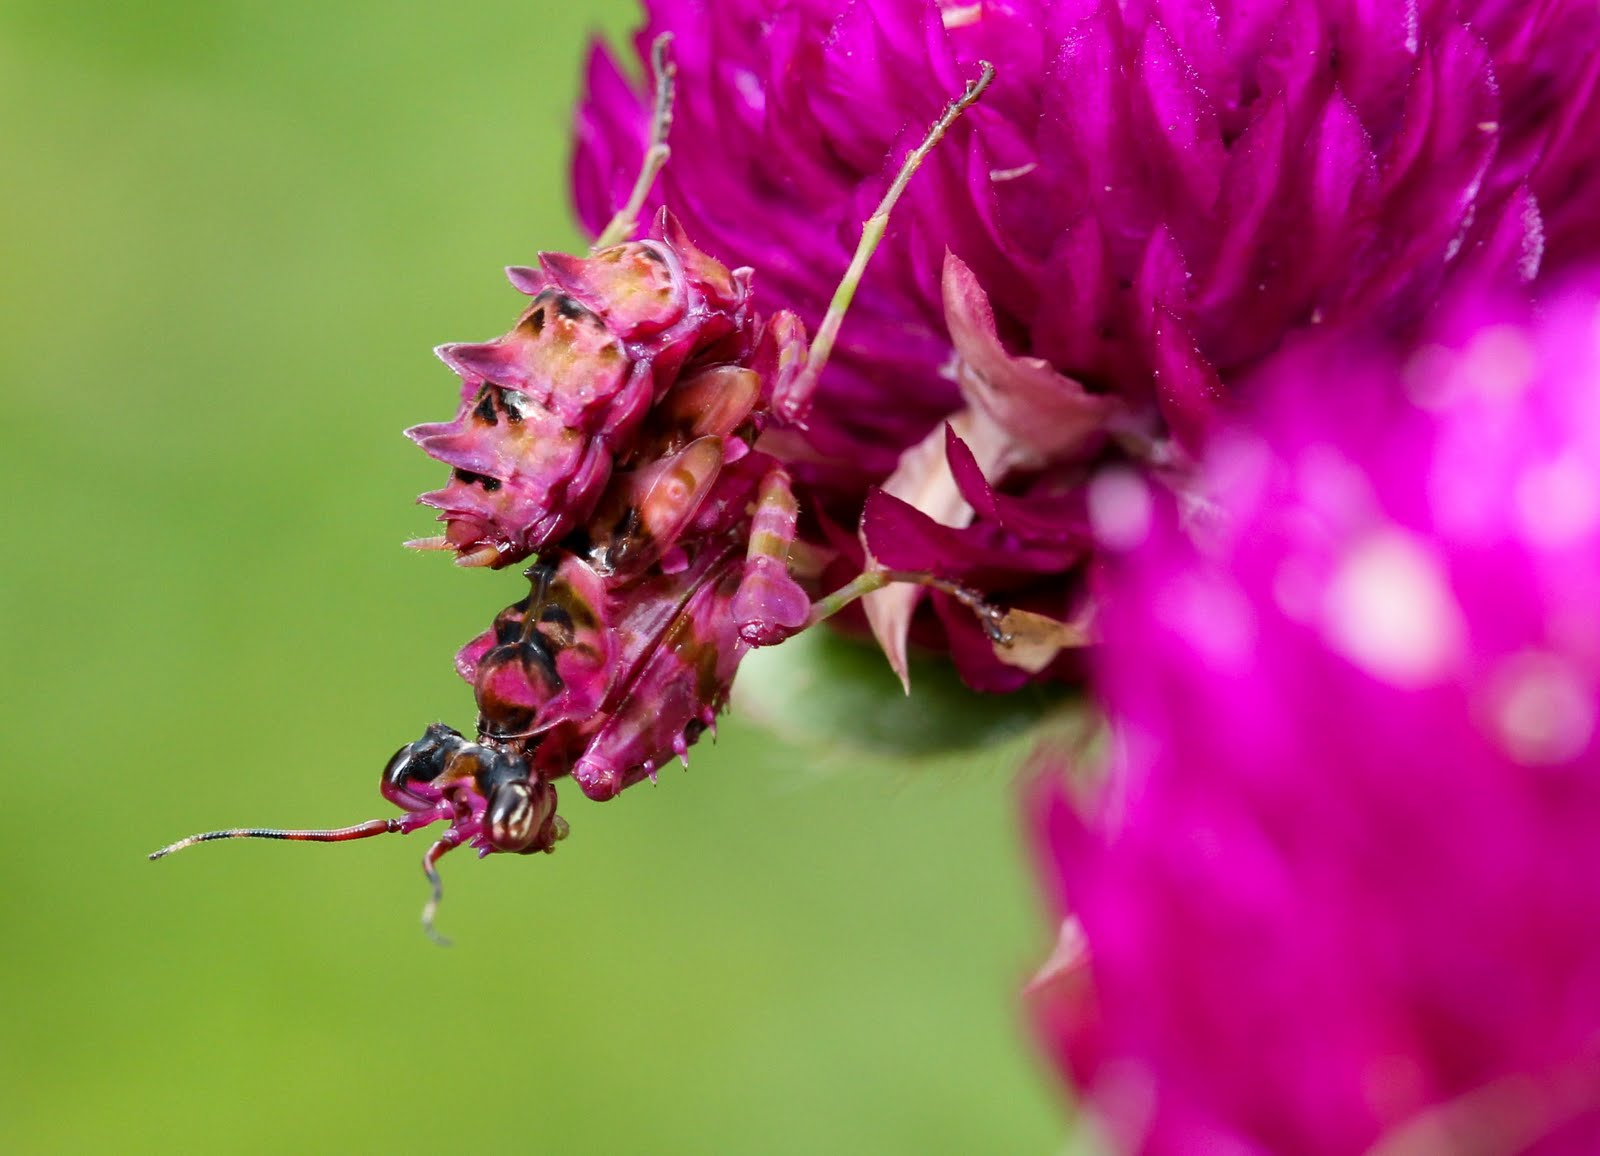 Uganda Wildlife Ecology And Travel Spiny Flower Mantis Nymphs